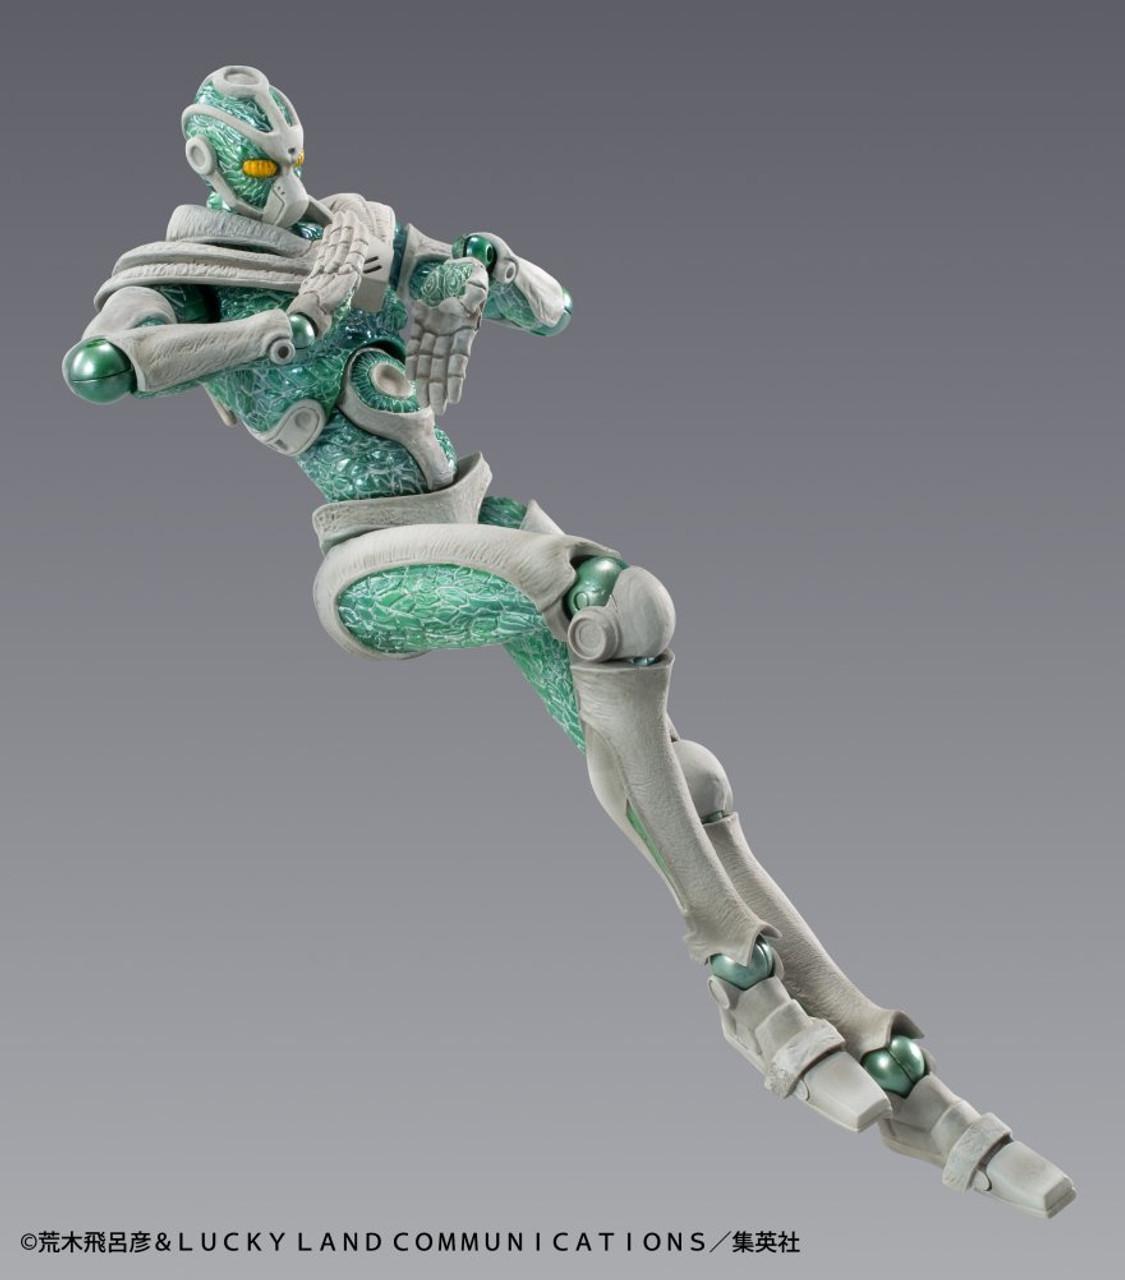 Medicos Super Action Statue Hierophant Green Figure JoJo/'s Bizarre Adventure